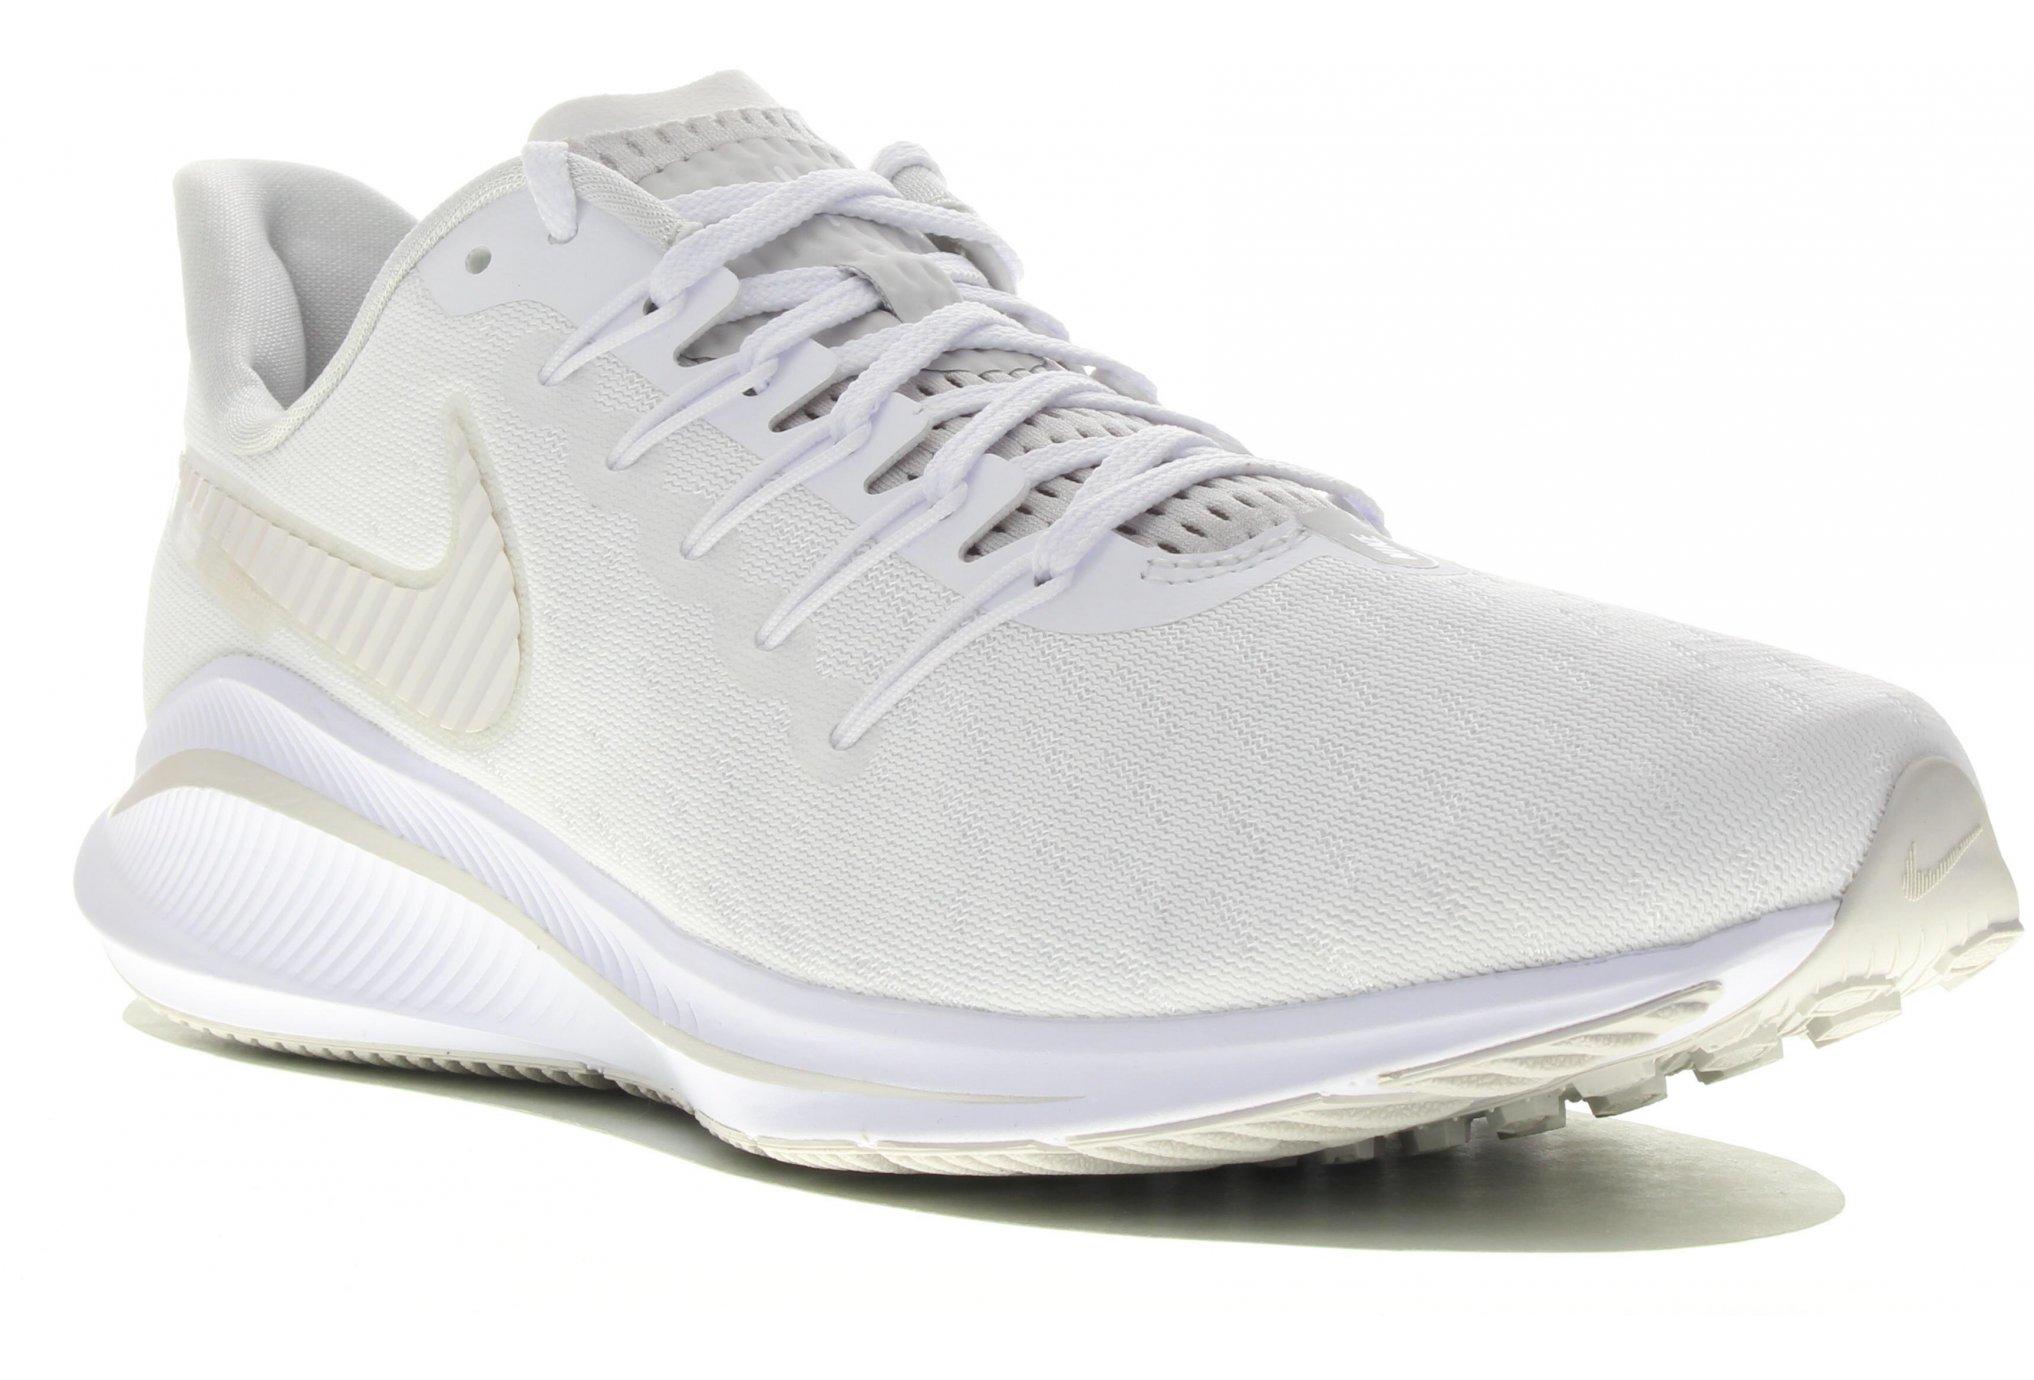 promo code 0eeba b6cd6 Nike Air Zoom Vomero 12 TB M homme Blanc pas cher